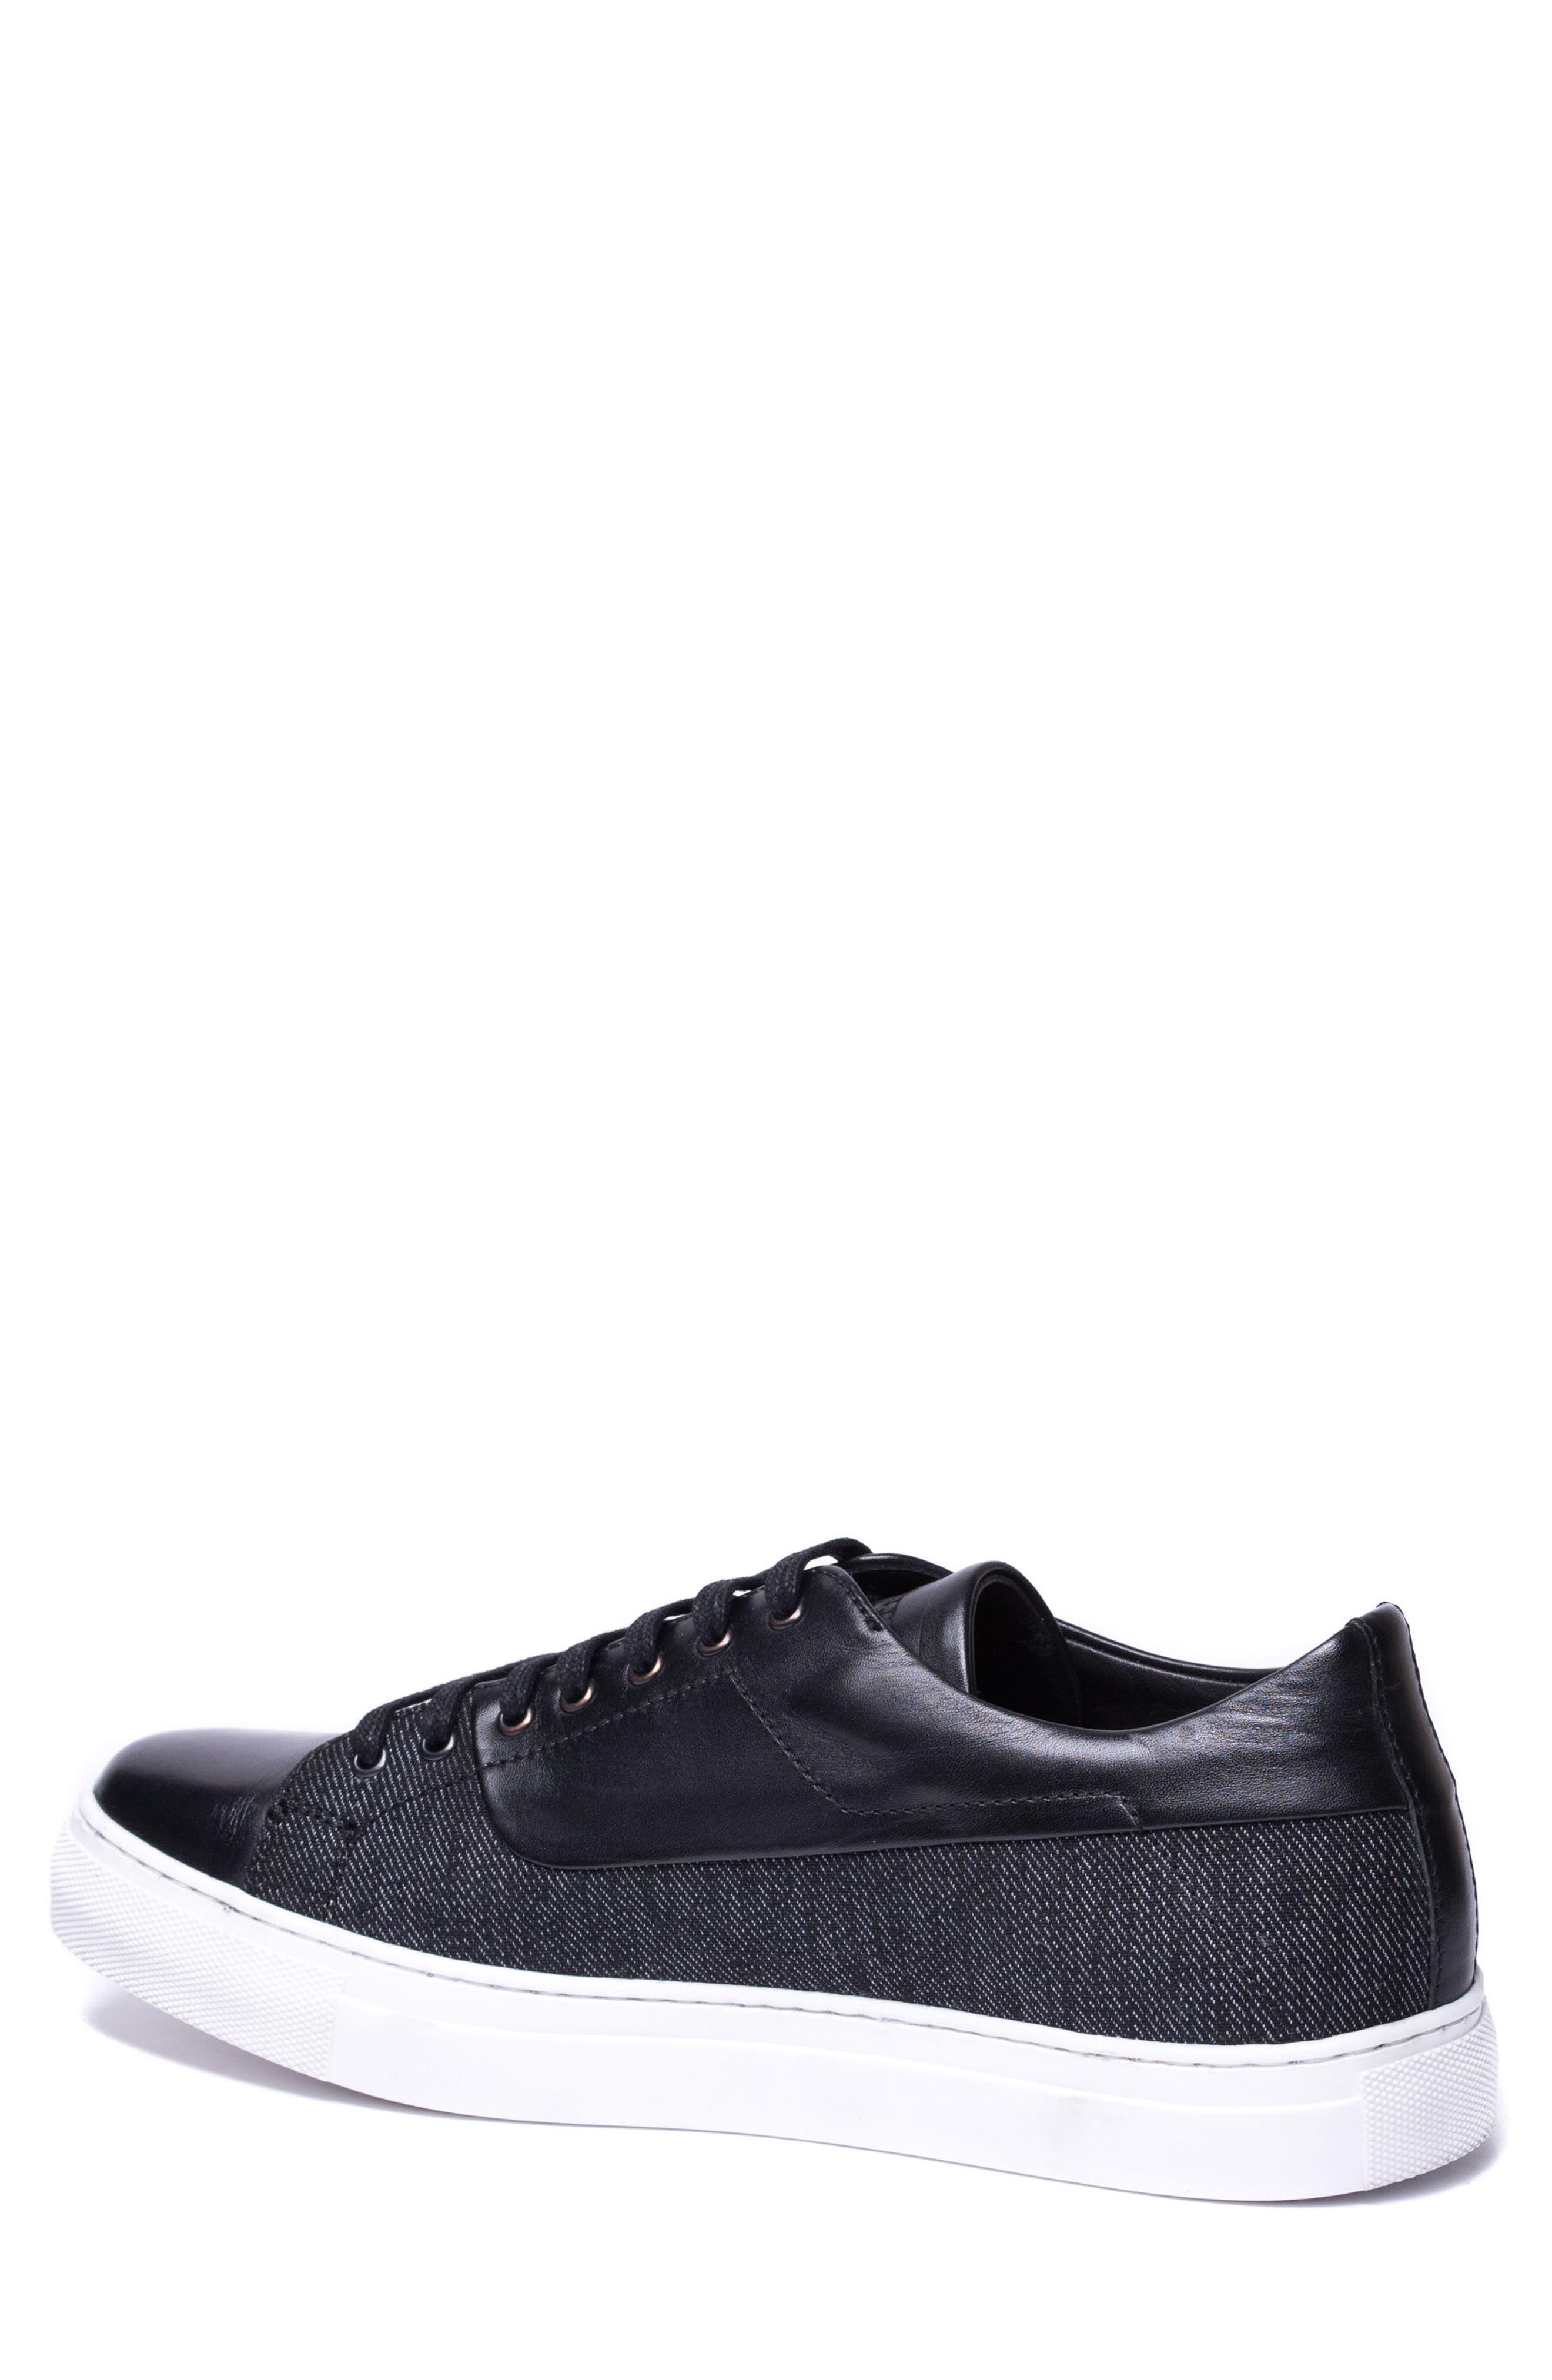 Luke Low Top Sneaker,                             Alternate thumbnail 2, color,                             Black Leather